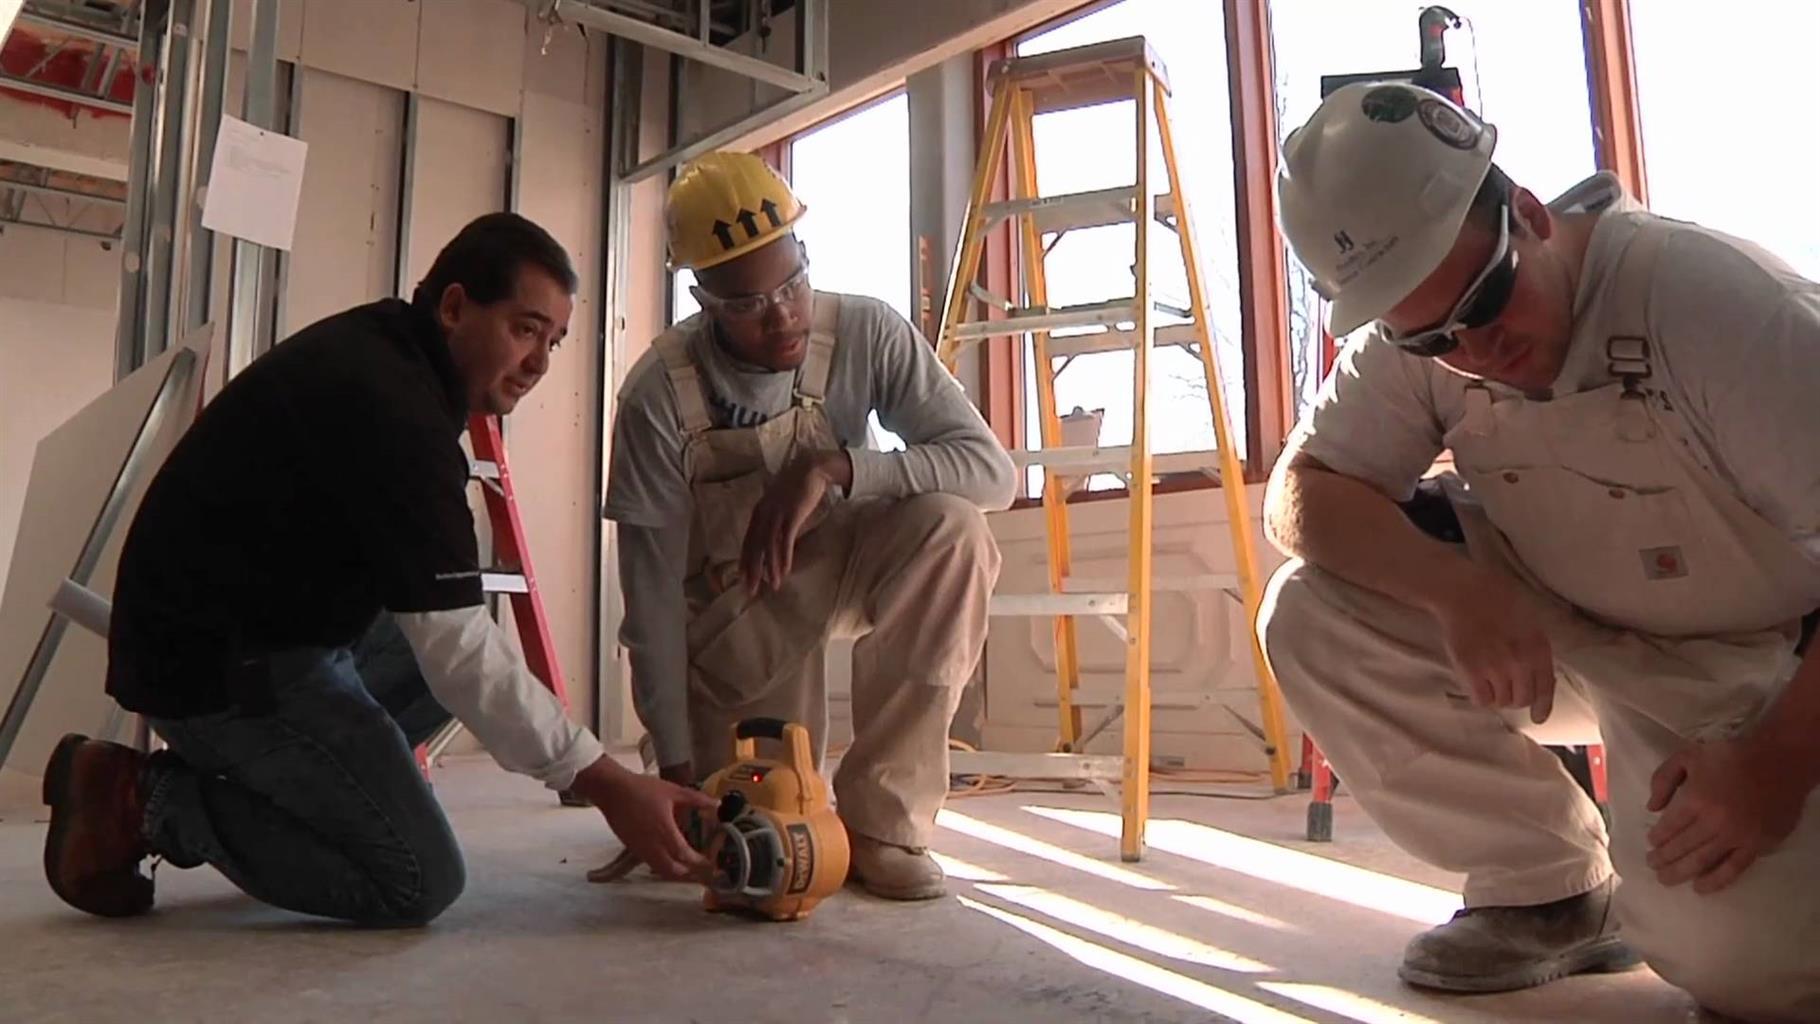 welding training Co2 Argon Arc Aluminium welding boilermaking courses training and artisan trade test #079-087-0183.